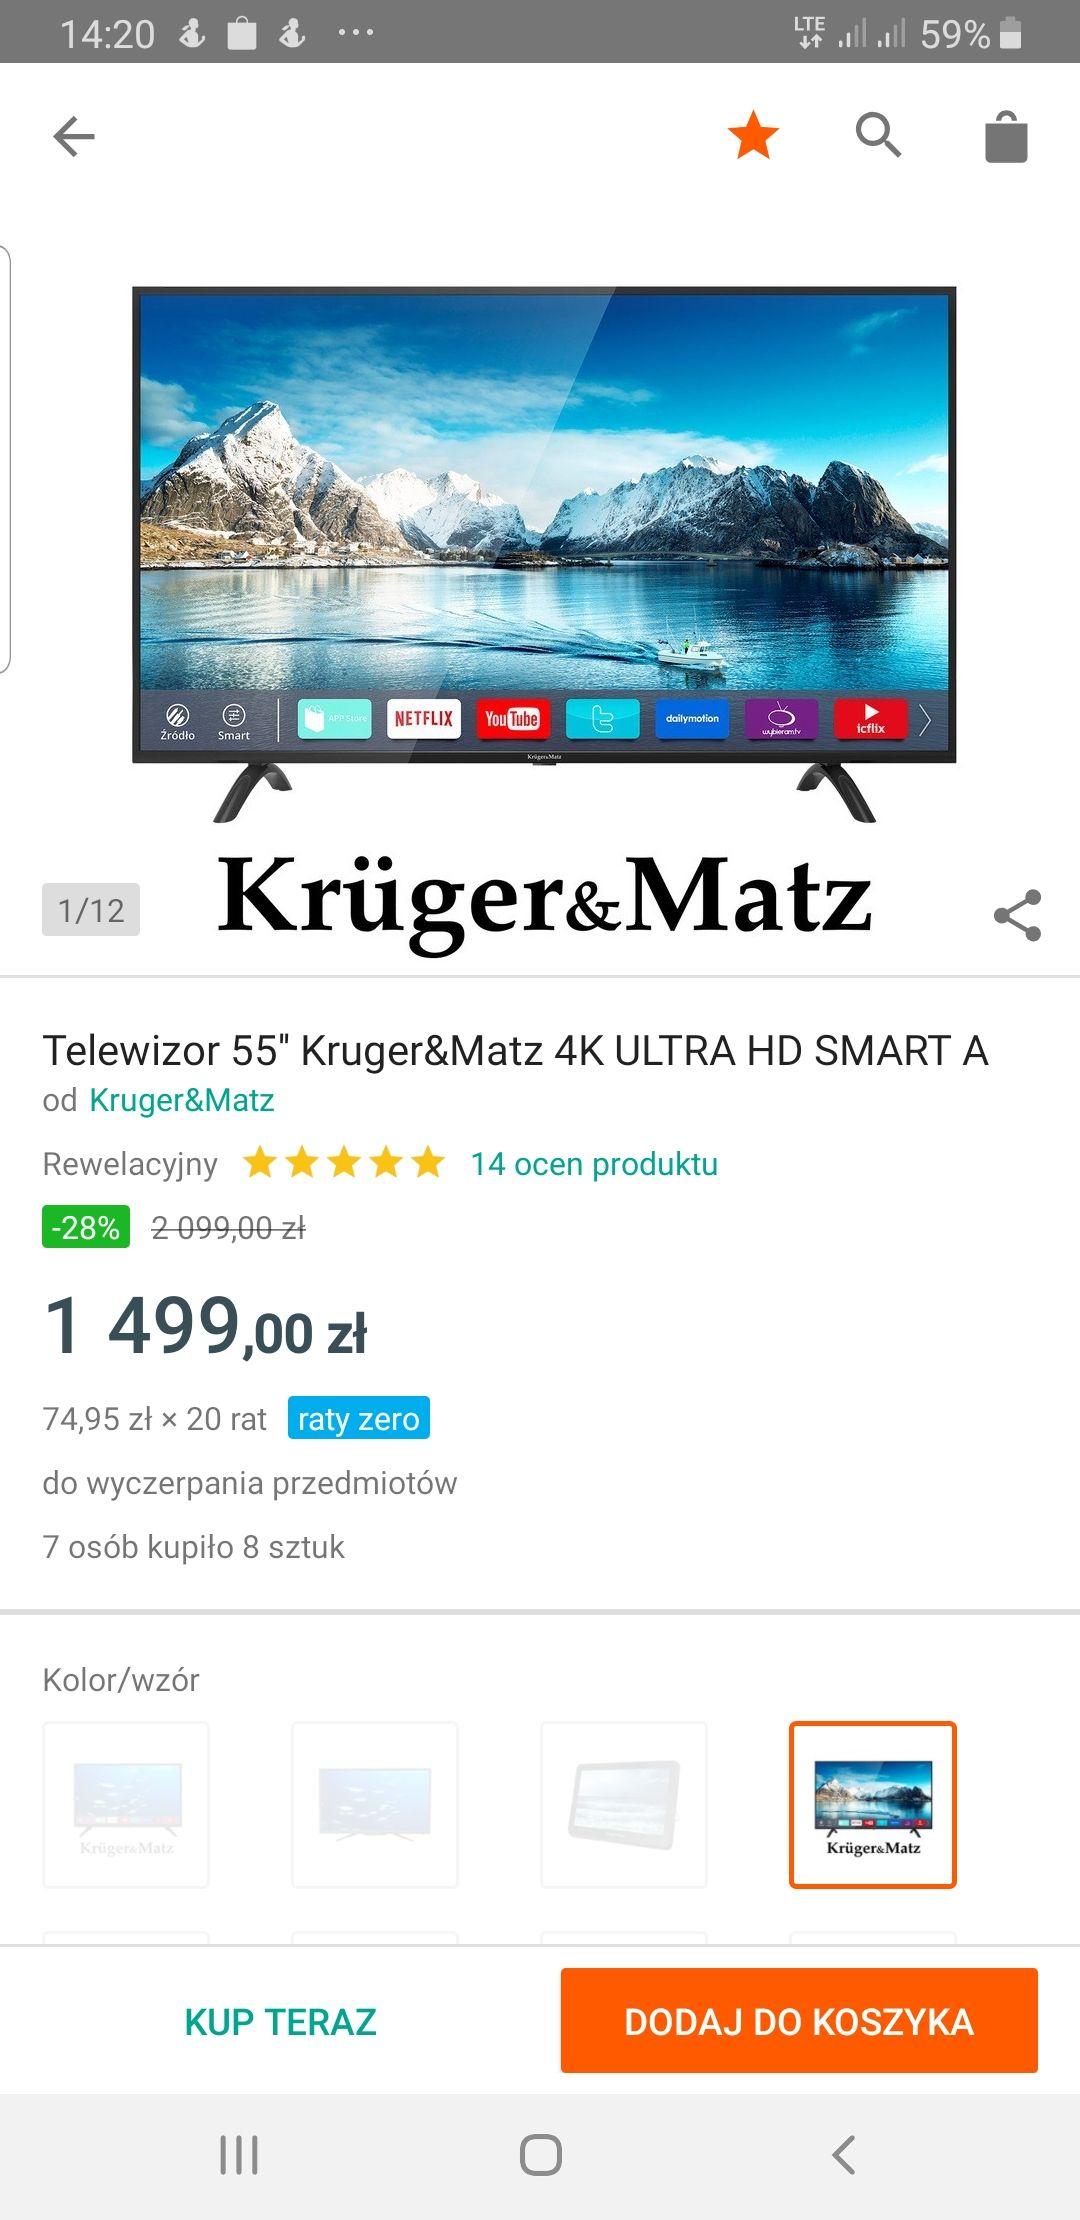 Telewizor 55'' Kruger&Matz 4K ULTRA HD SMART A